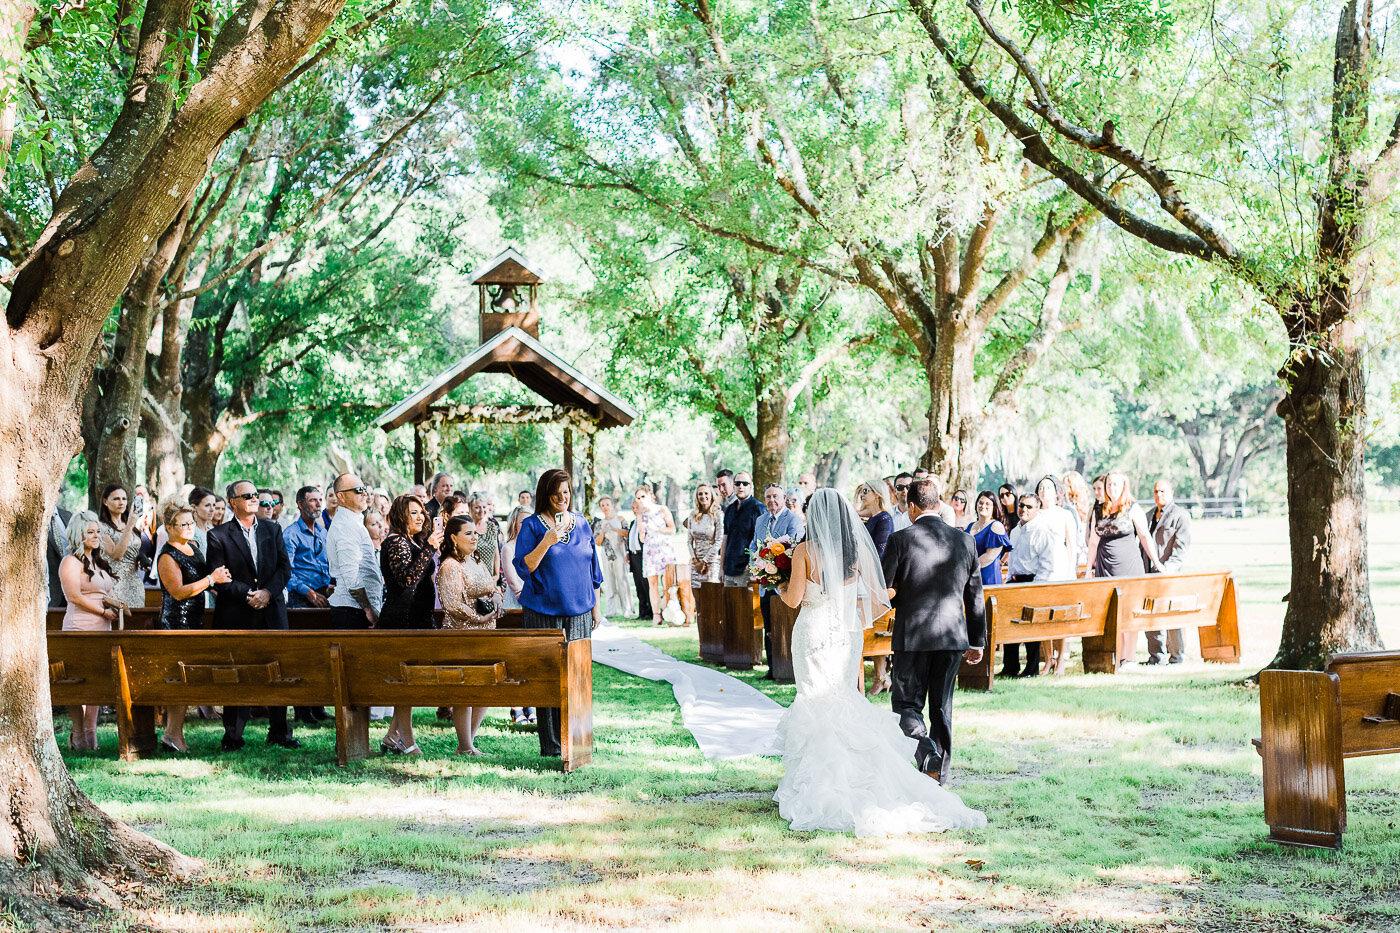 Lakeland-barn-wedding-at-white-horse-ranch-36.jpg